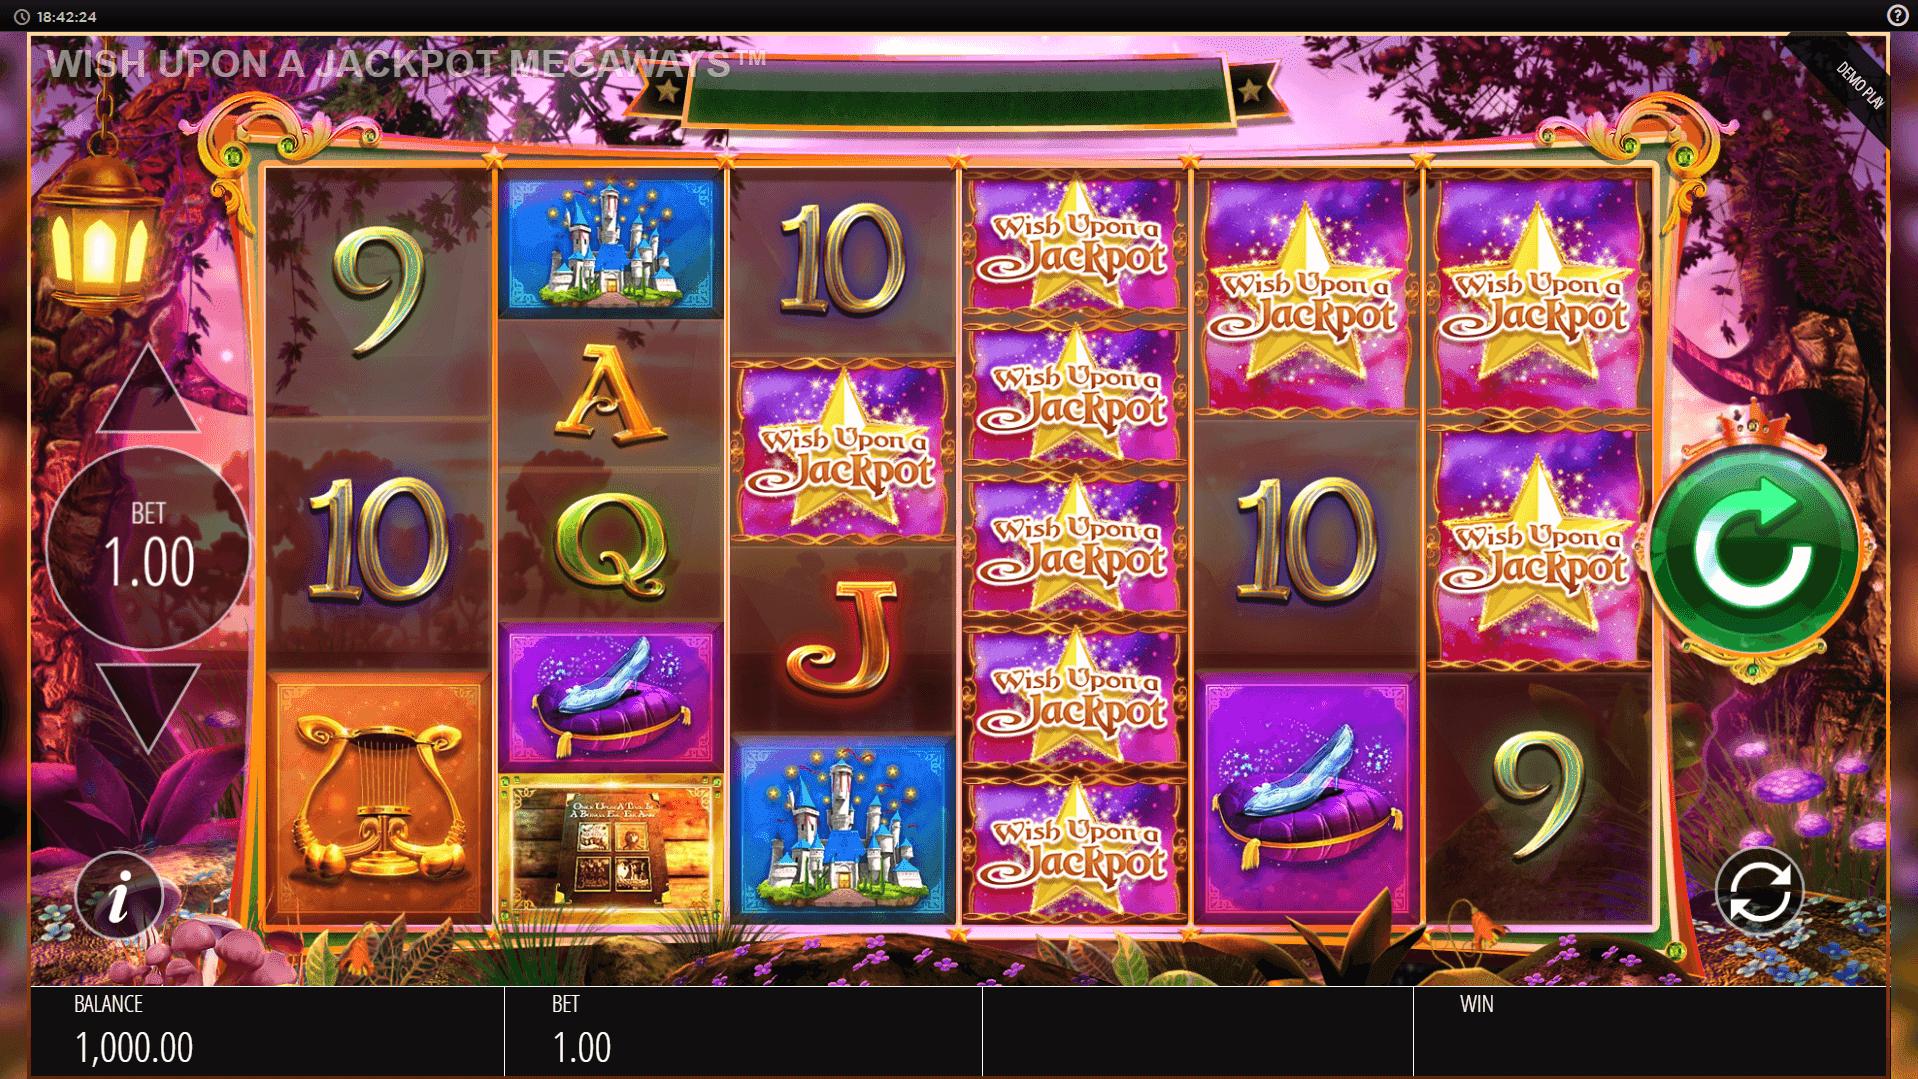 Wish Upon A Jackpot Megaways slot machine screenshot